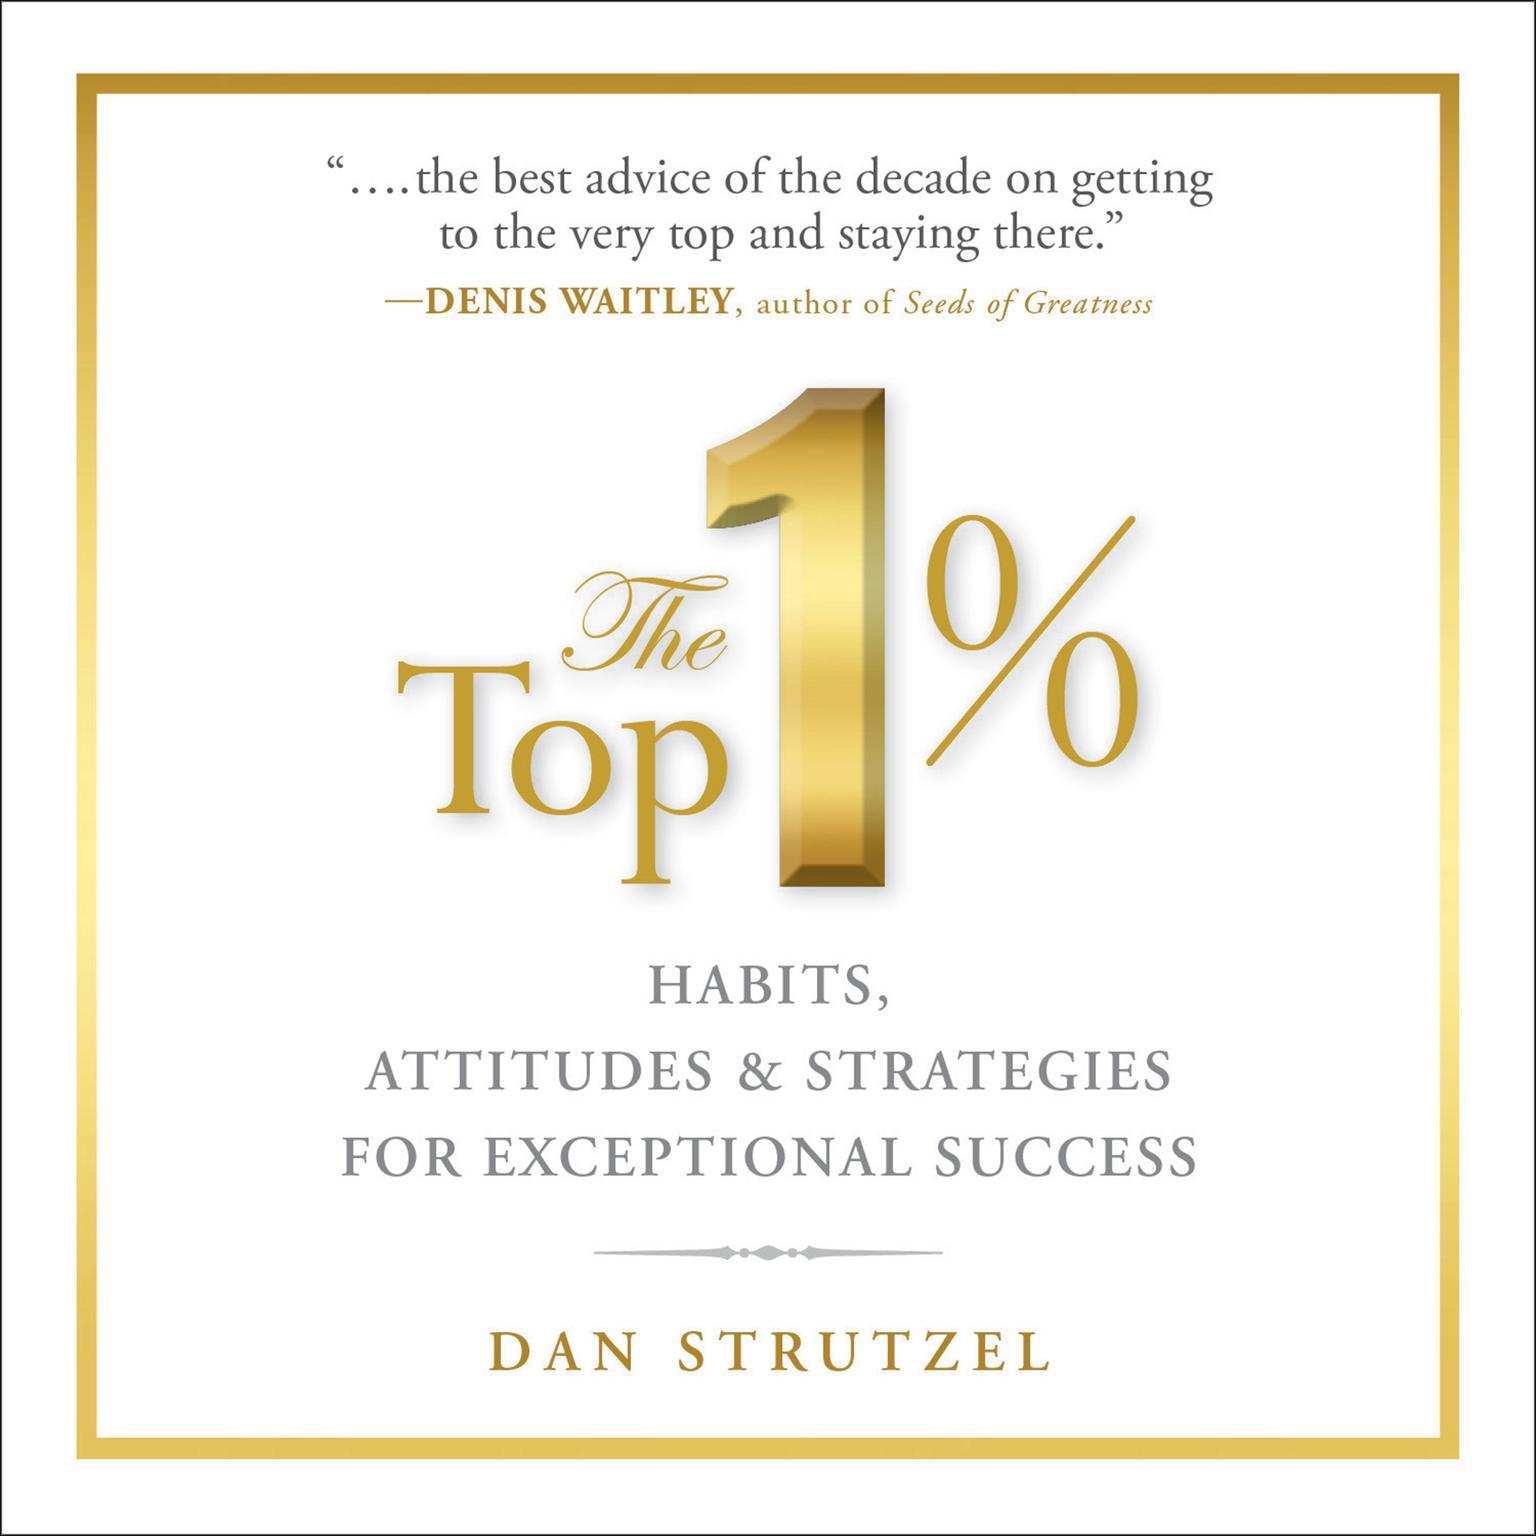 The Top 1%: Habits, Attitudes & Strategies For Exceptional Success Audiobook, by Dan Strutzel